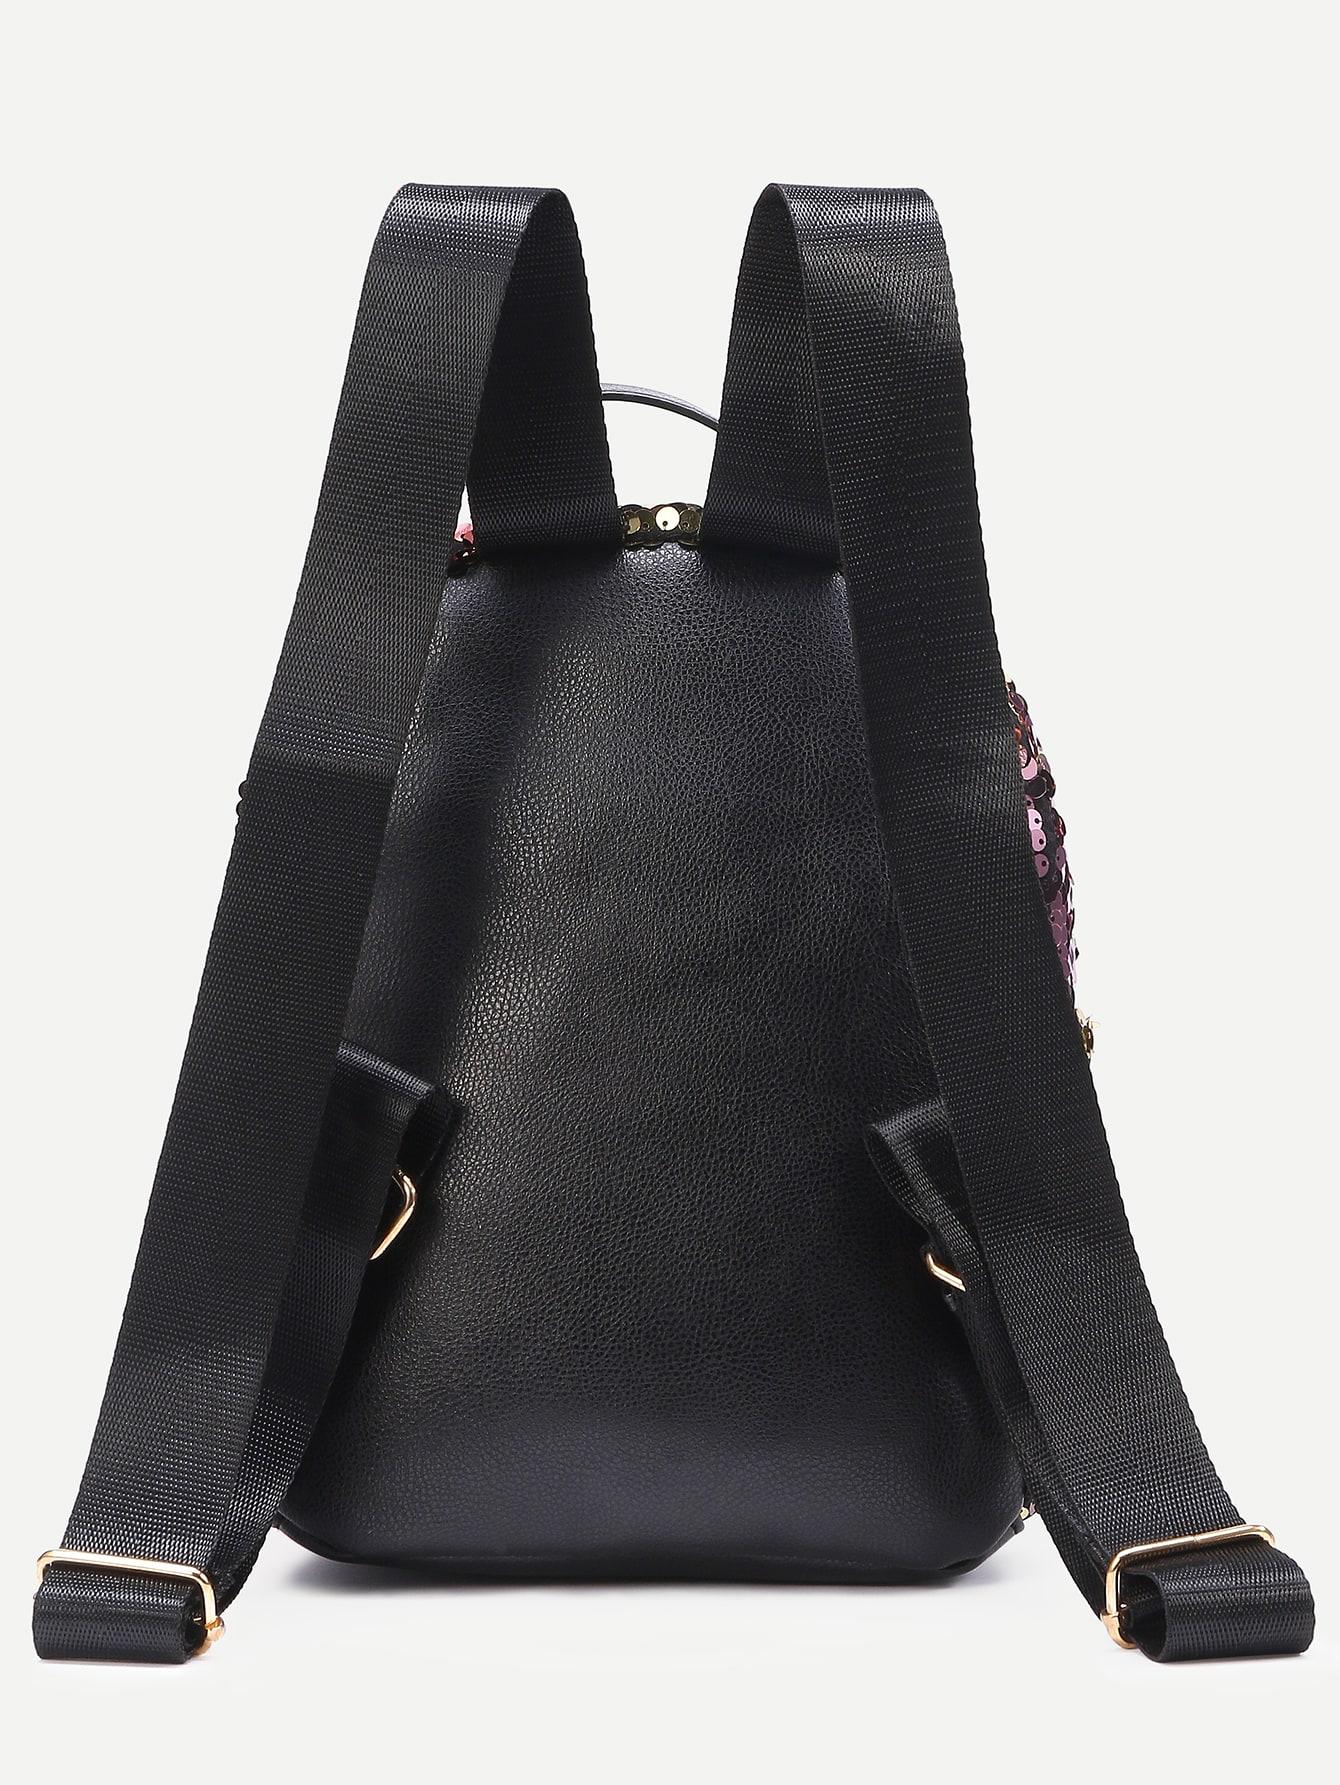 bag160810306_2